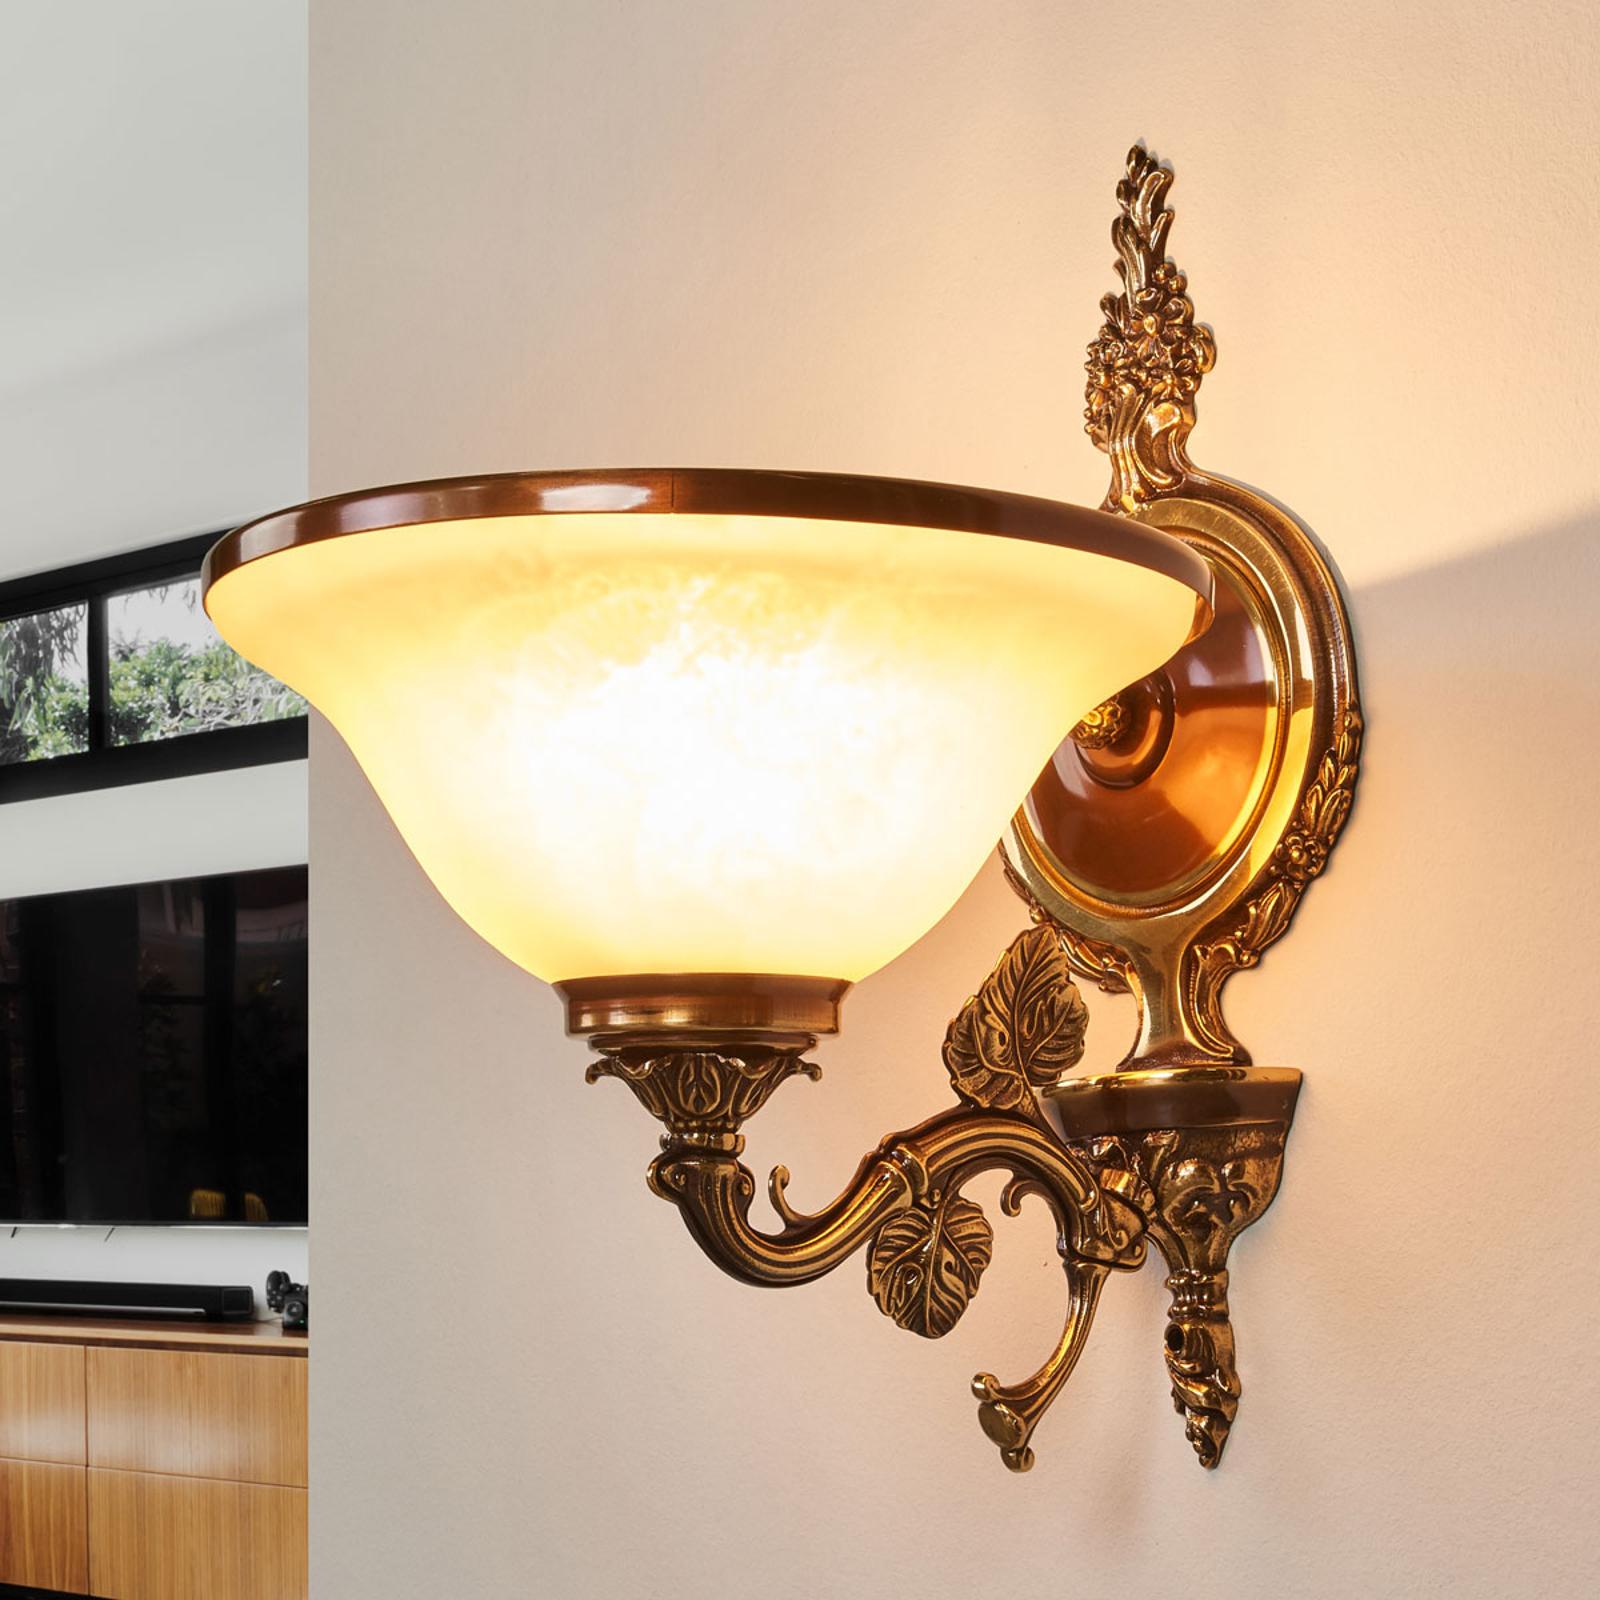 Bijzonder mooie wandlamp RIALTO